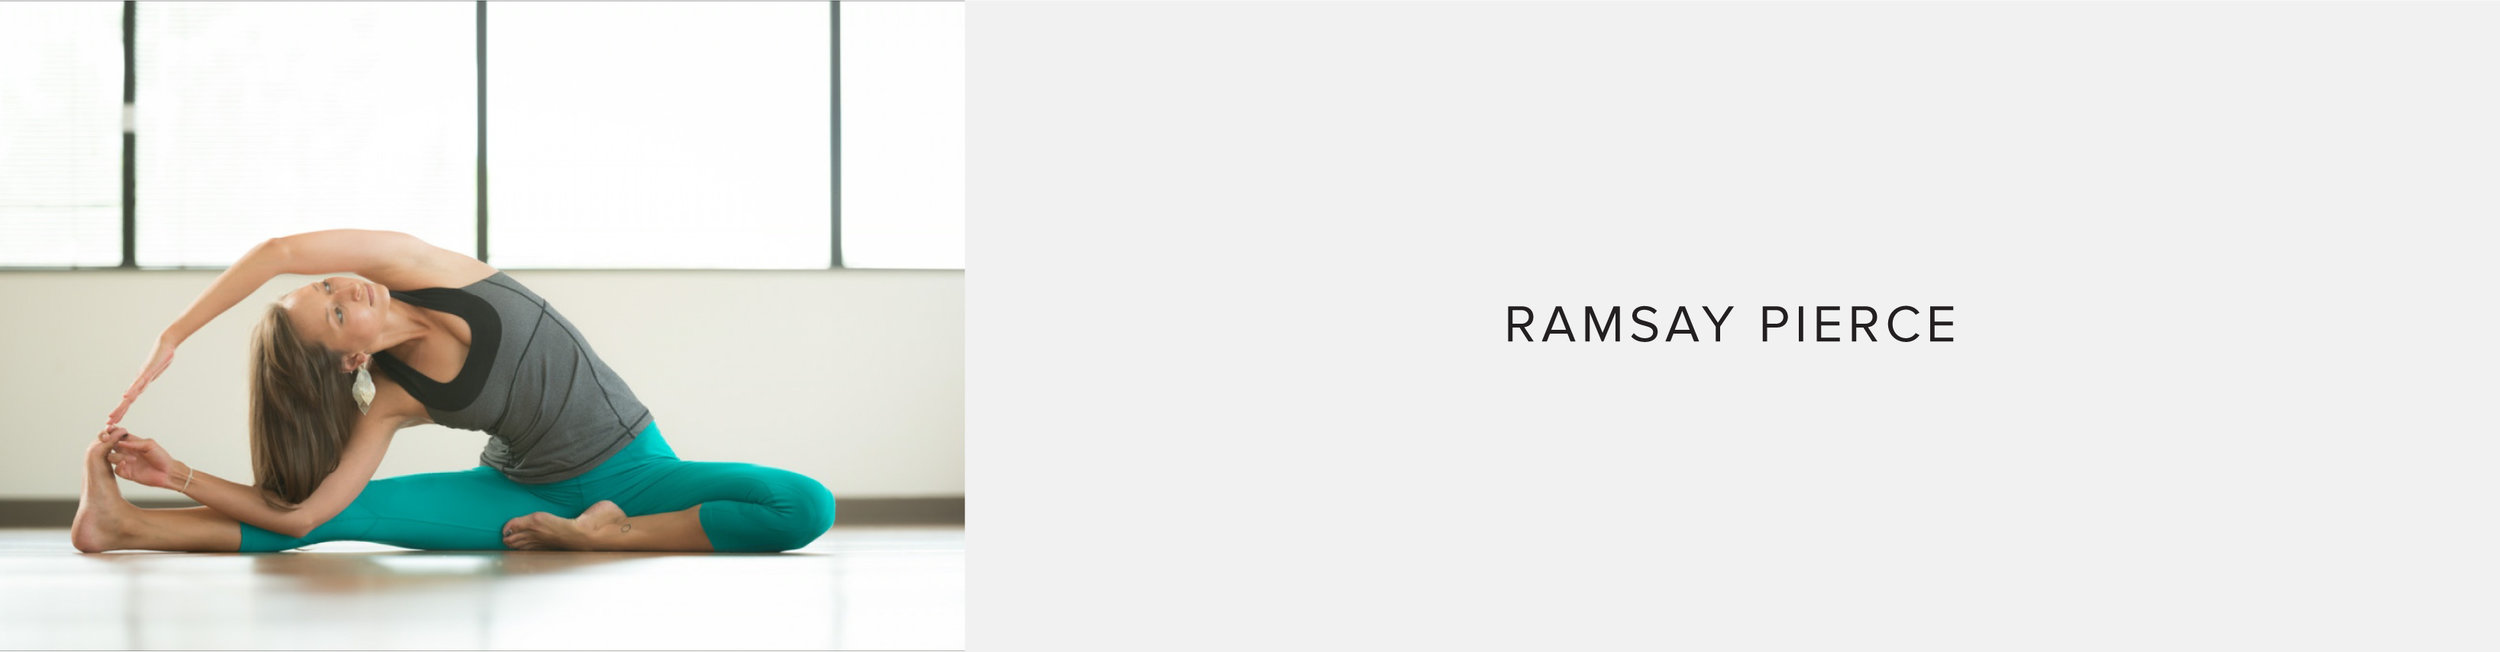 Meet-Ramsay.jpg